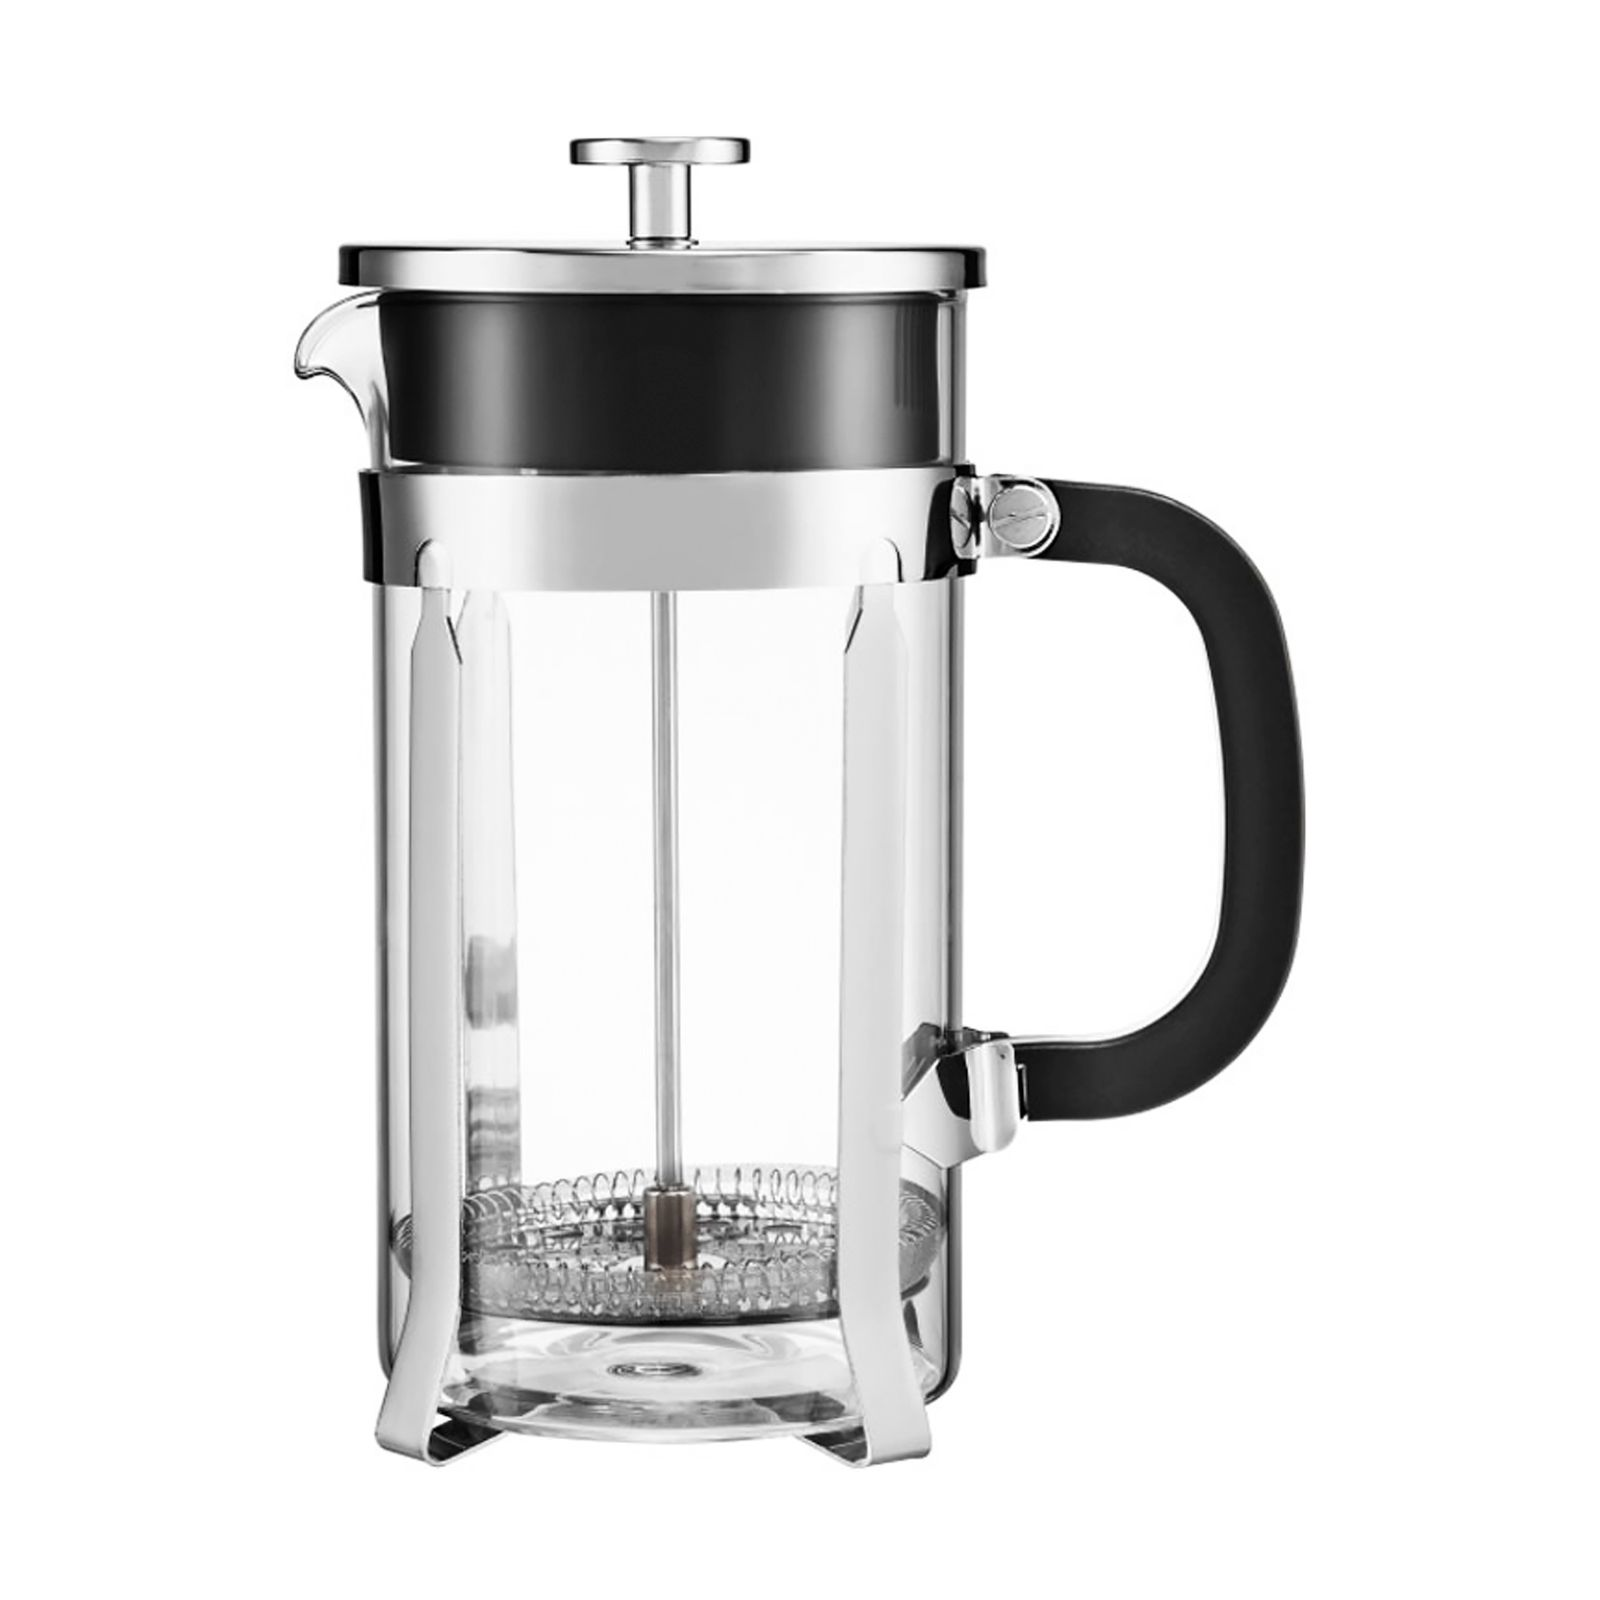 Coffee maker Barista 1000 ml AMBITION